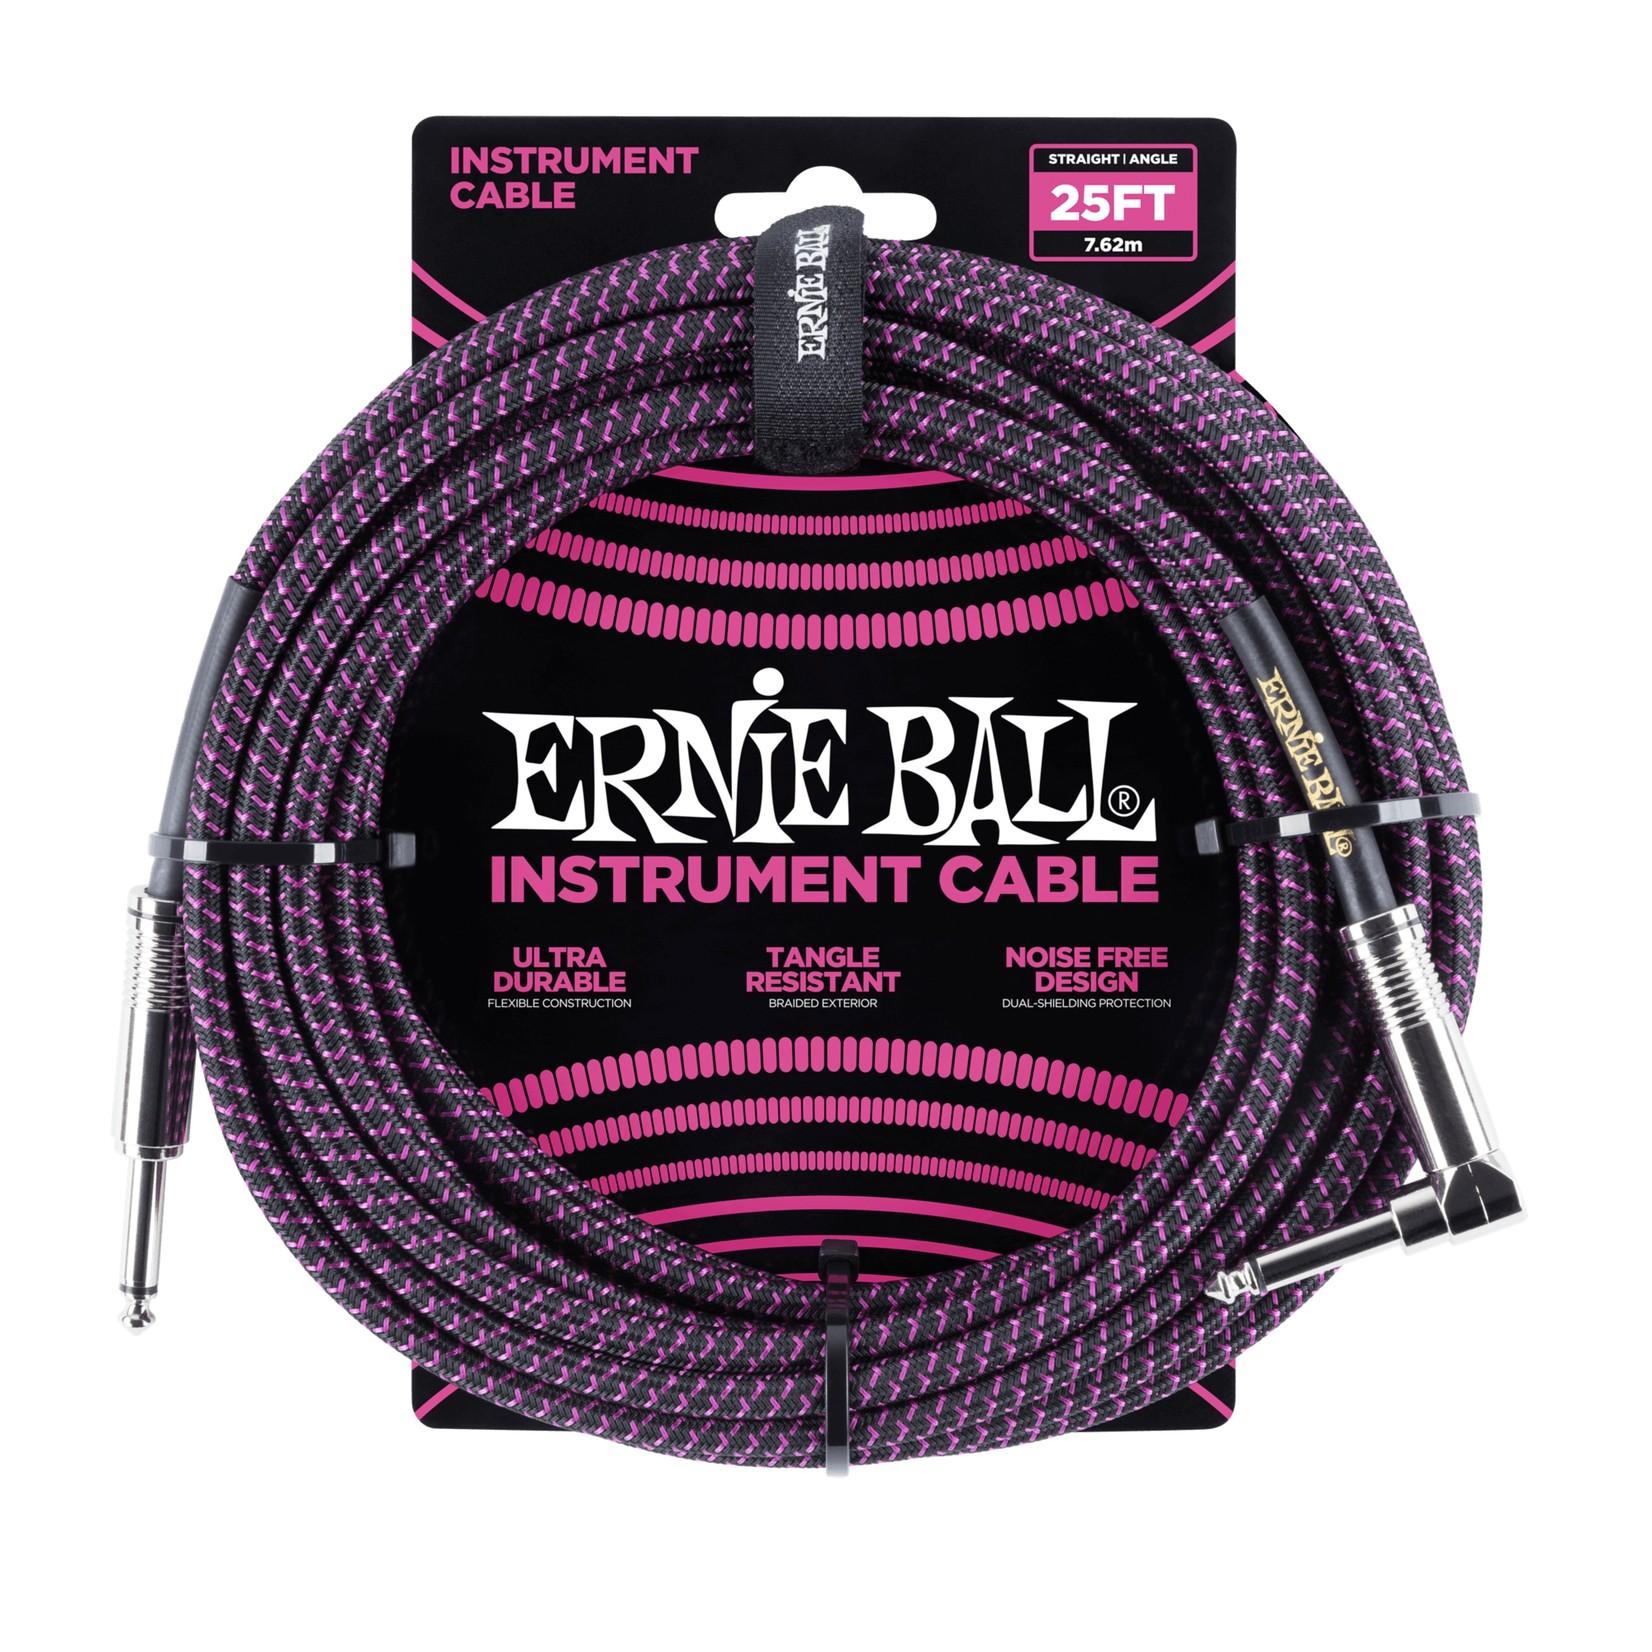 Ernie Ball Ernie Ball 25' Braided Straight / Angle Instrument Cable, Black/Purple